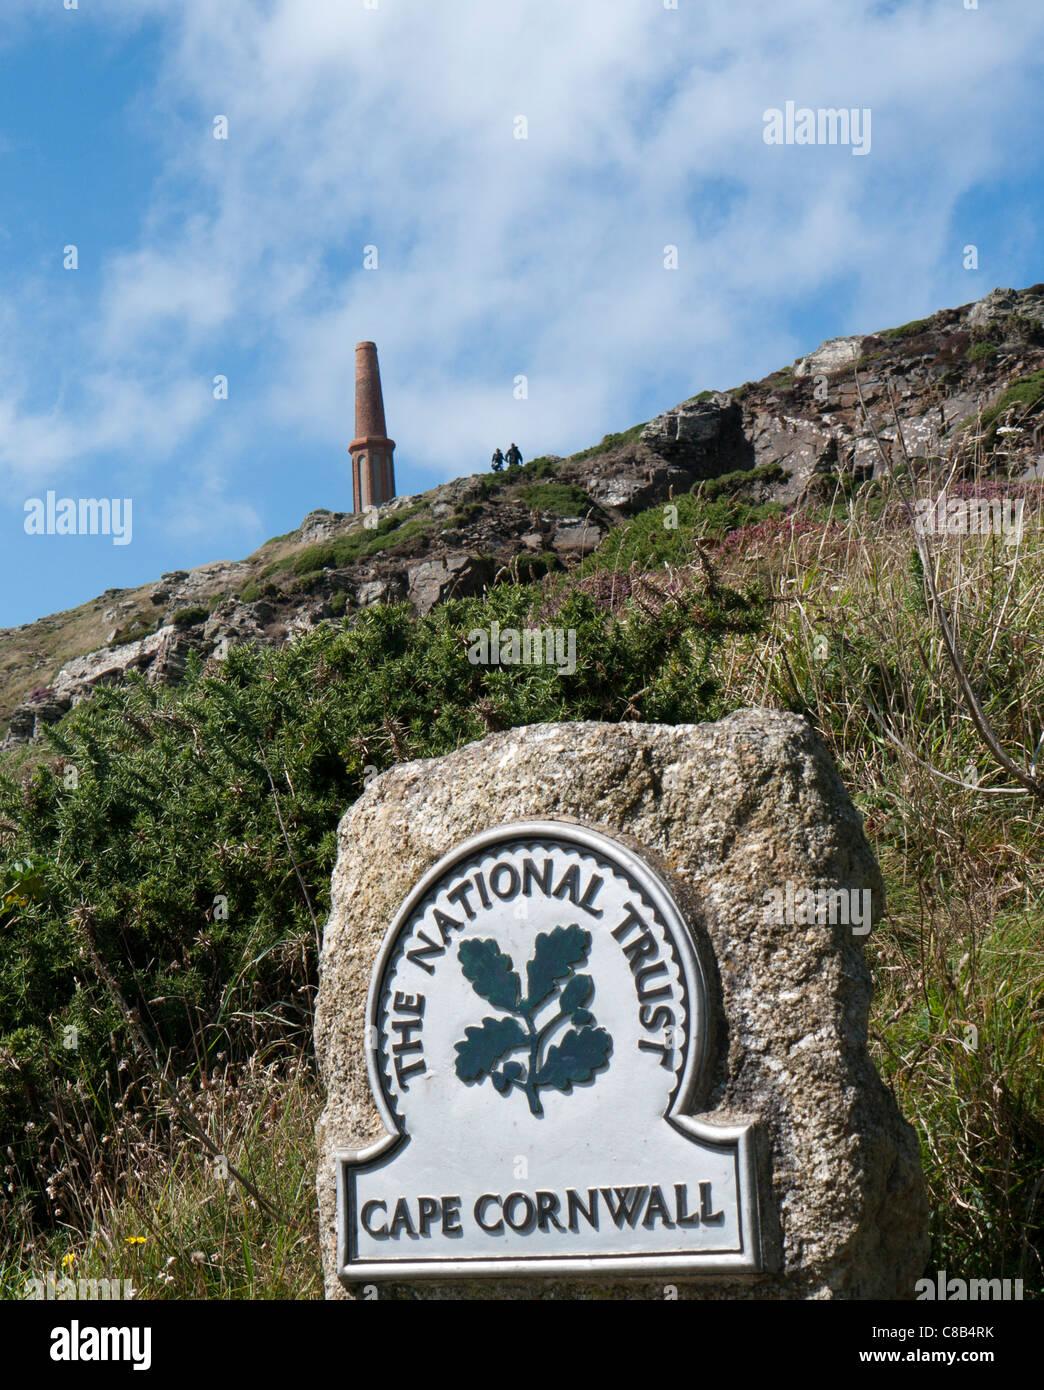 Cape Cornwall Saint Just, Cornwall in Britain - Stock Image